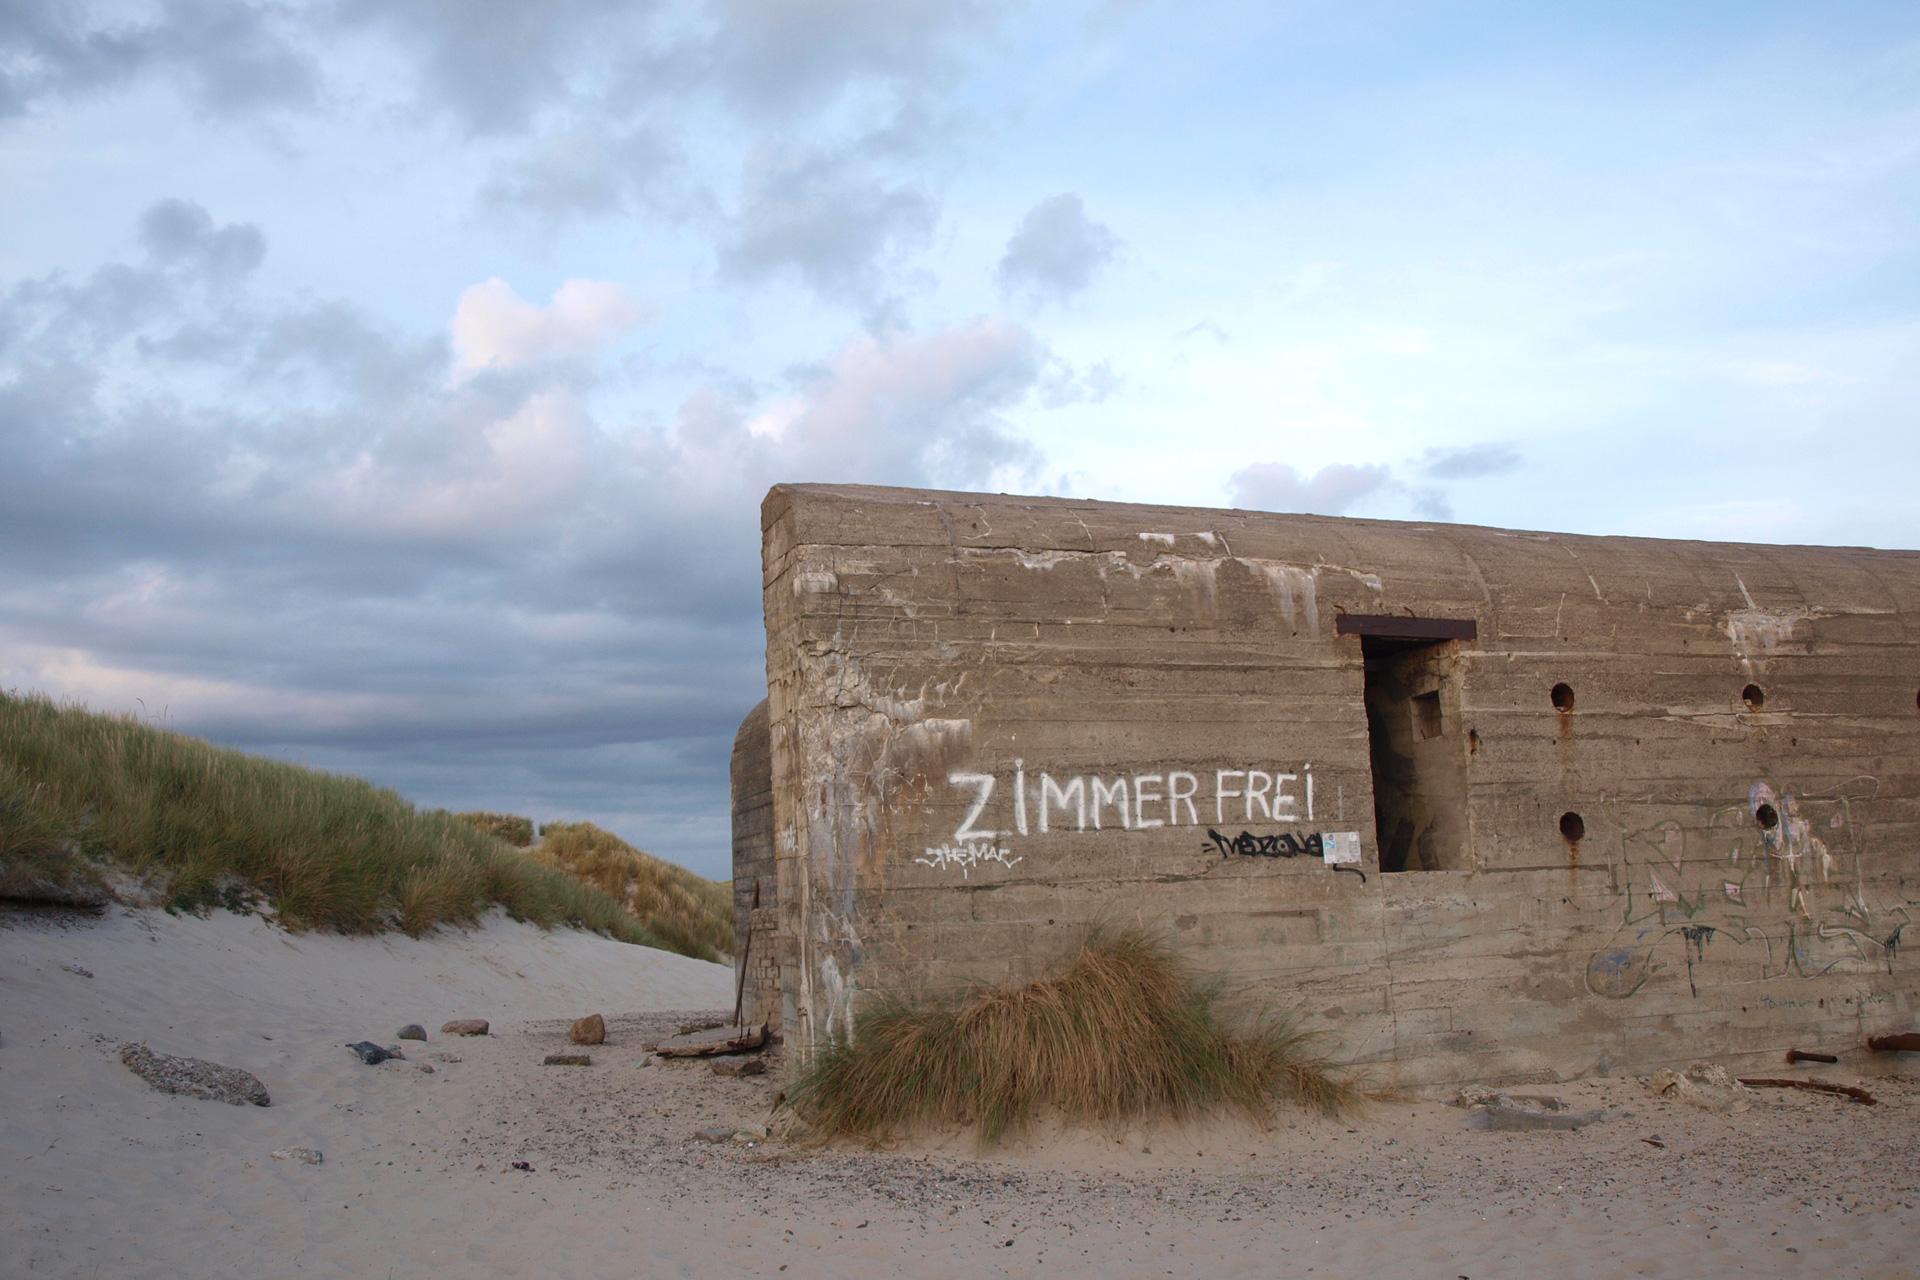 buchstabenplus in Skagen: Bunker